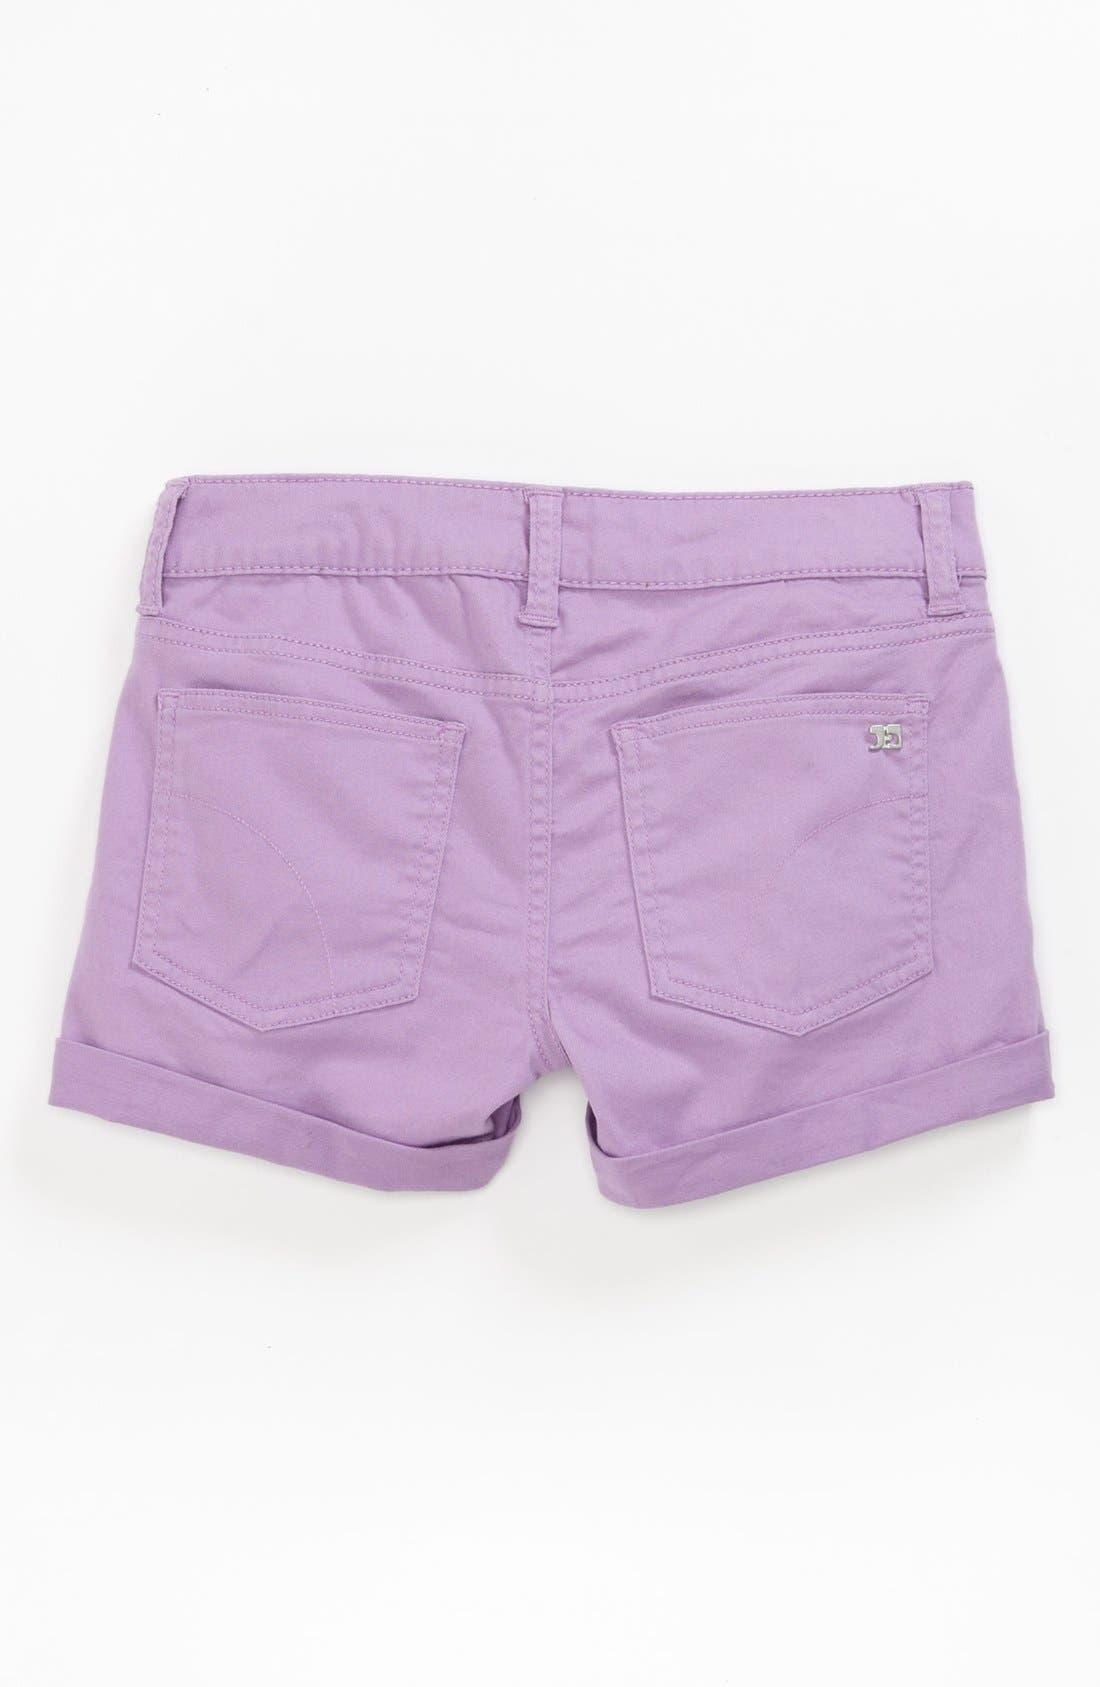 Alternate Image 1 Selected - Joe's Roll Cuff Shorts (Little Girls & Big Girls)